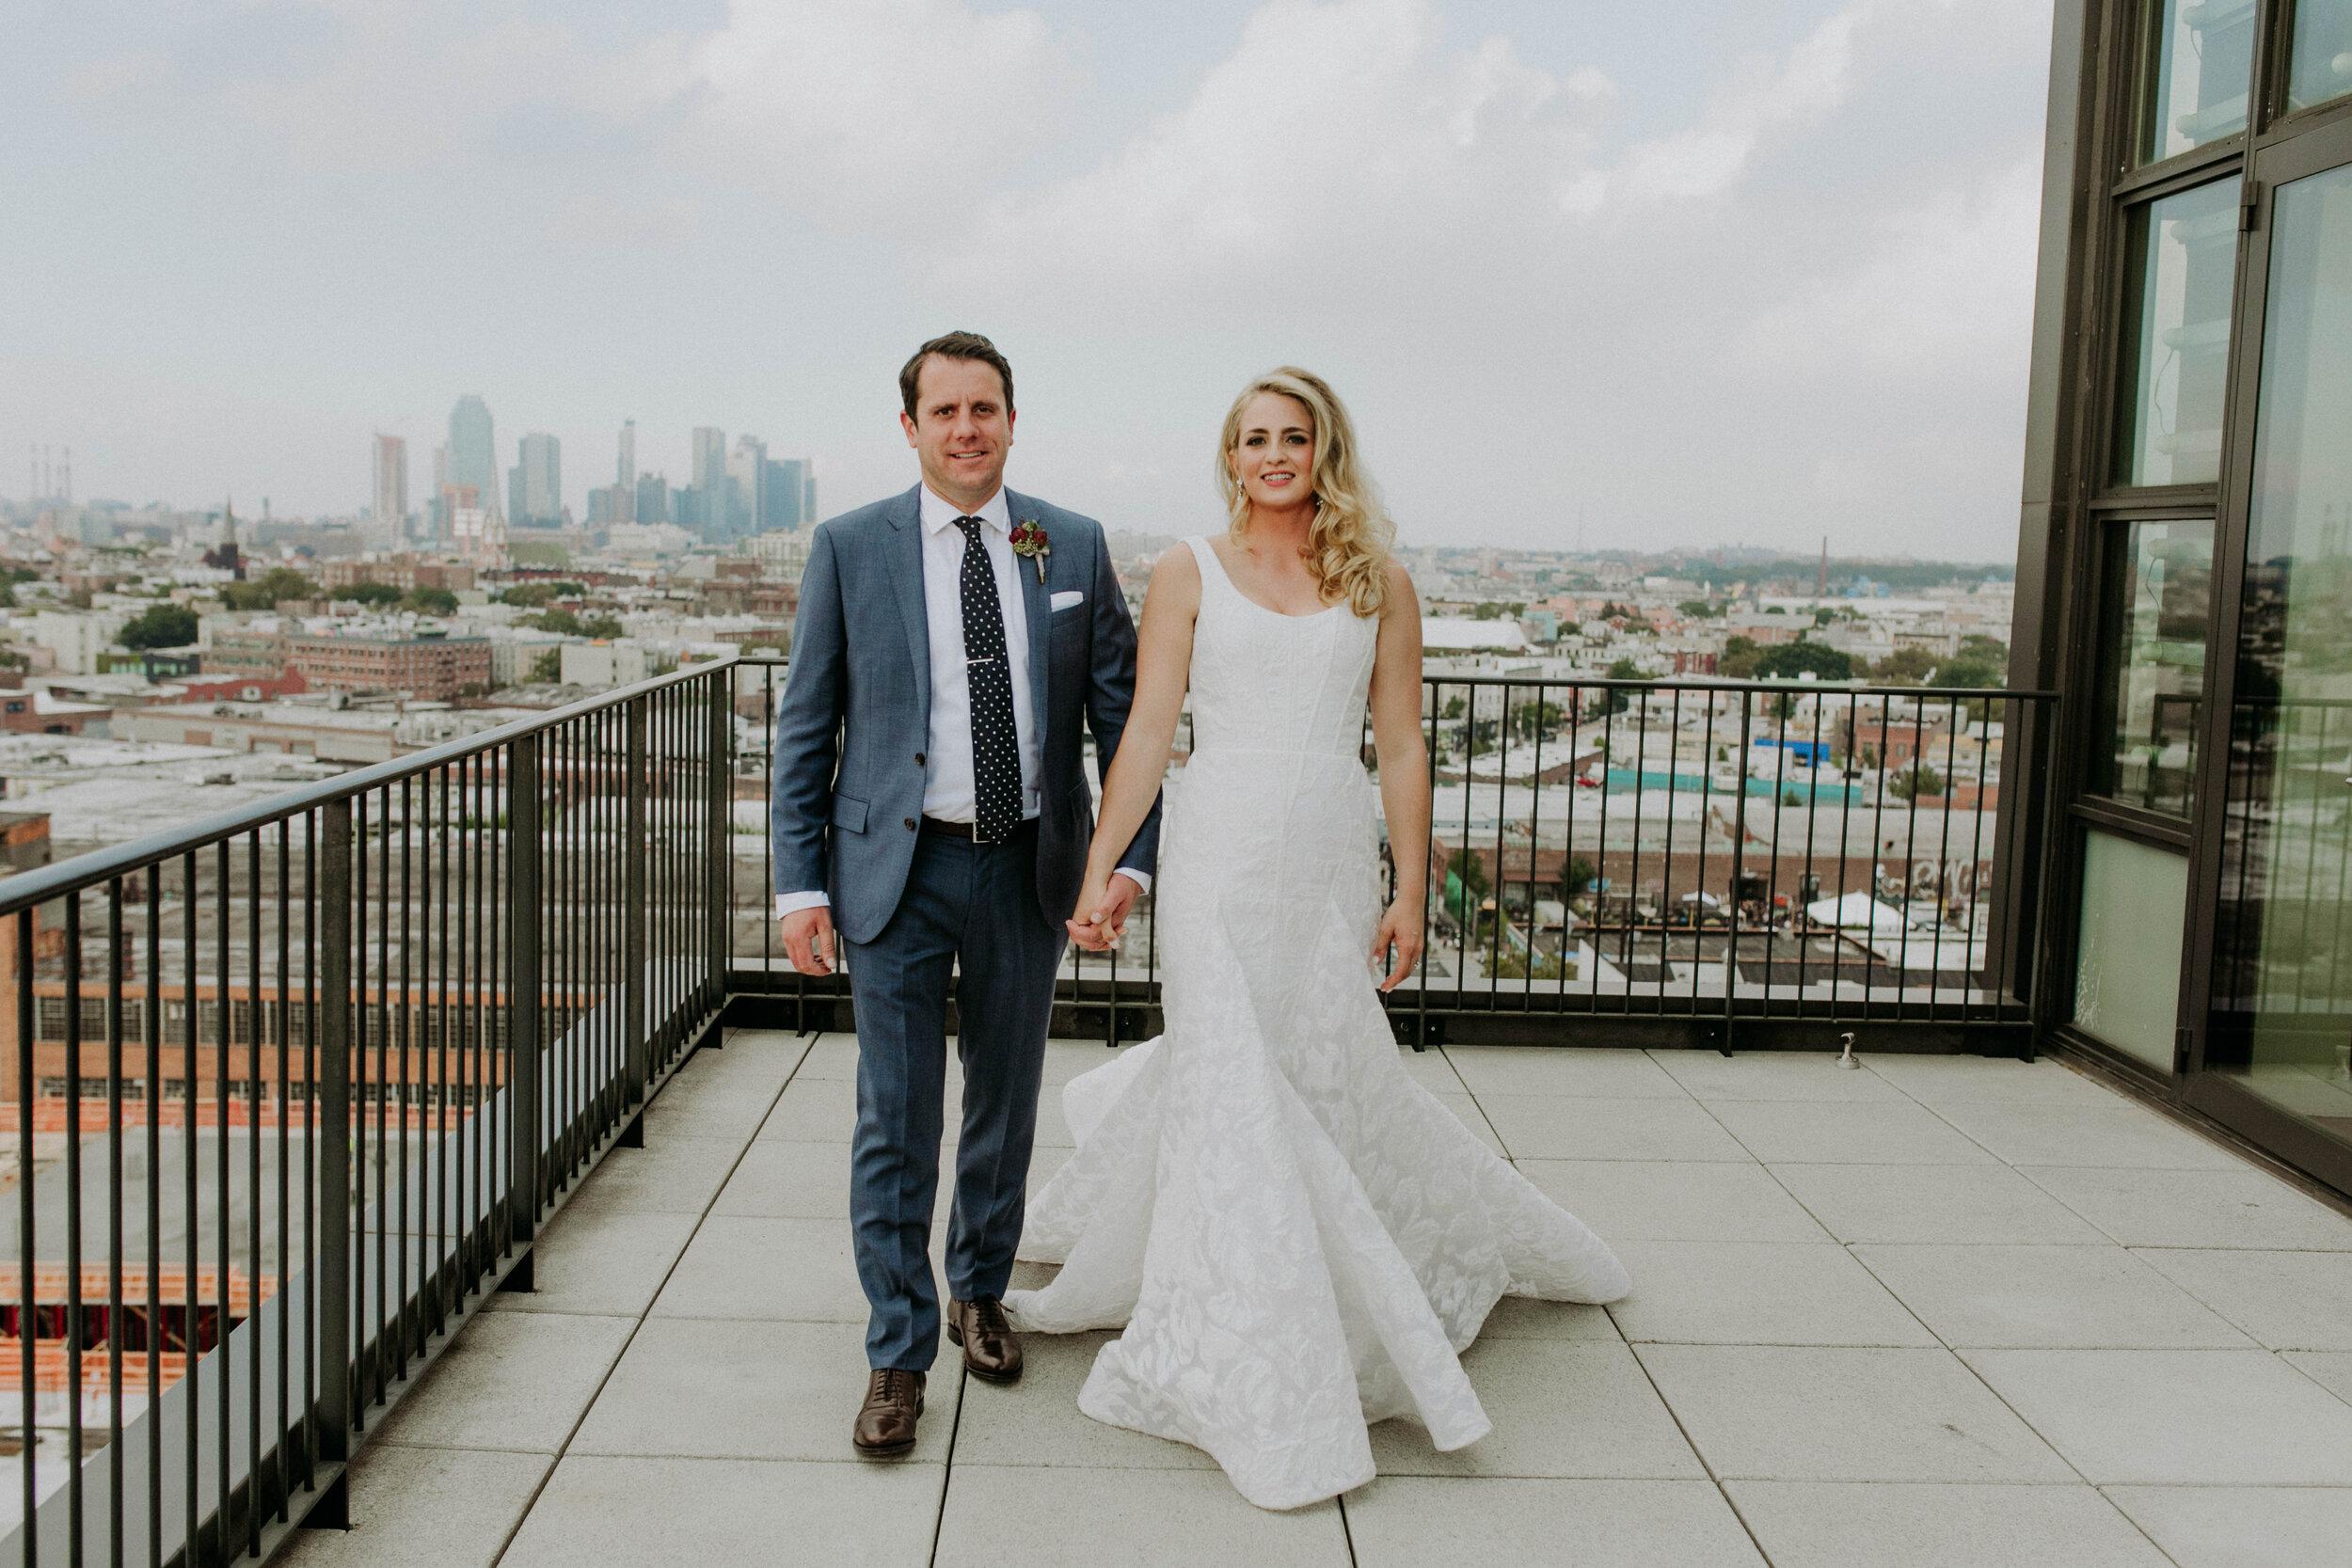 brooklyn-wedding-photographer-amber-gress-0127-.jpg